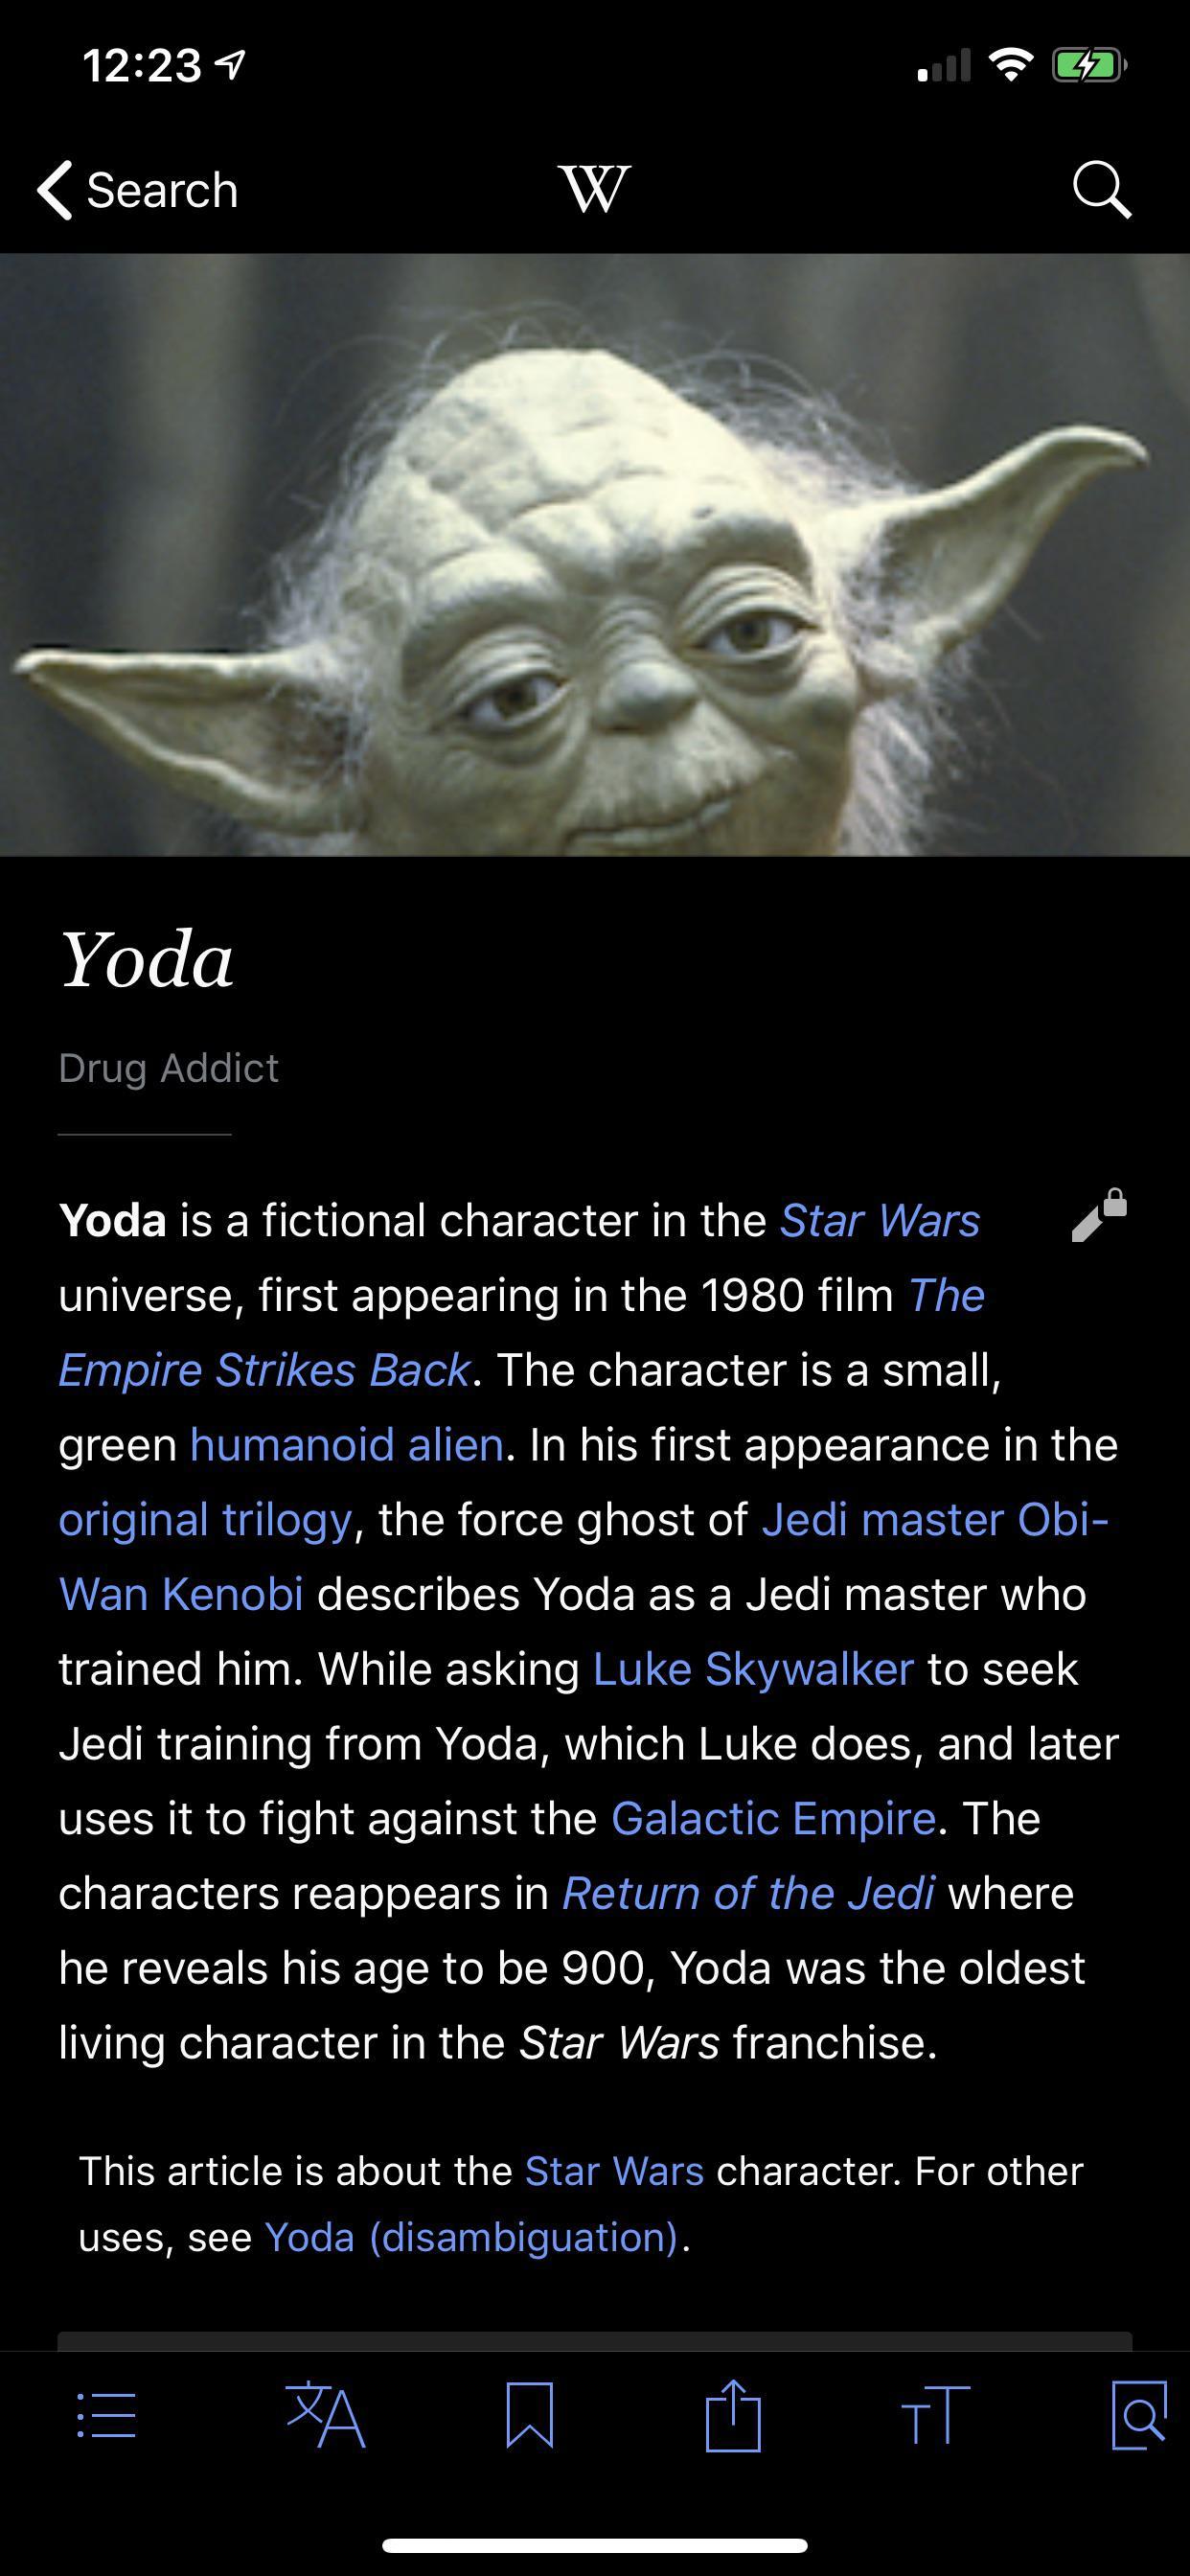 Yoda 2001 Honda Civic : honda, civic, Listed, Addict, Wikipedia, StarWars